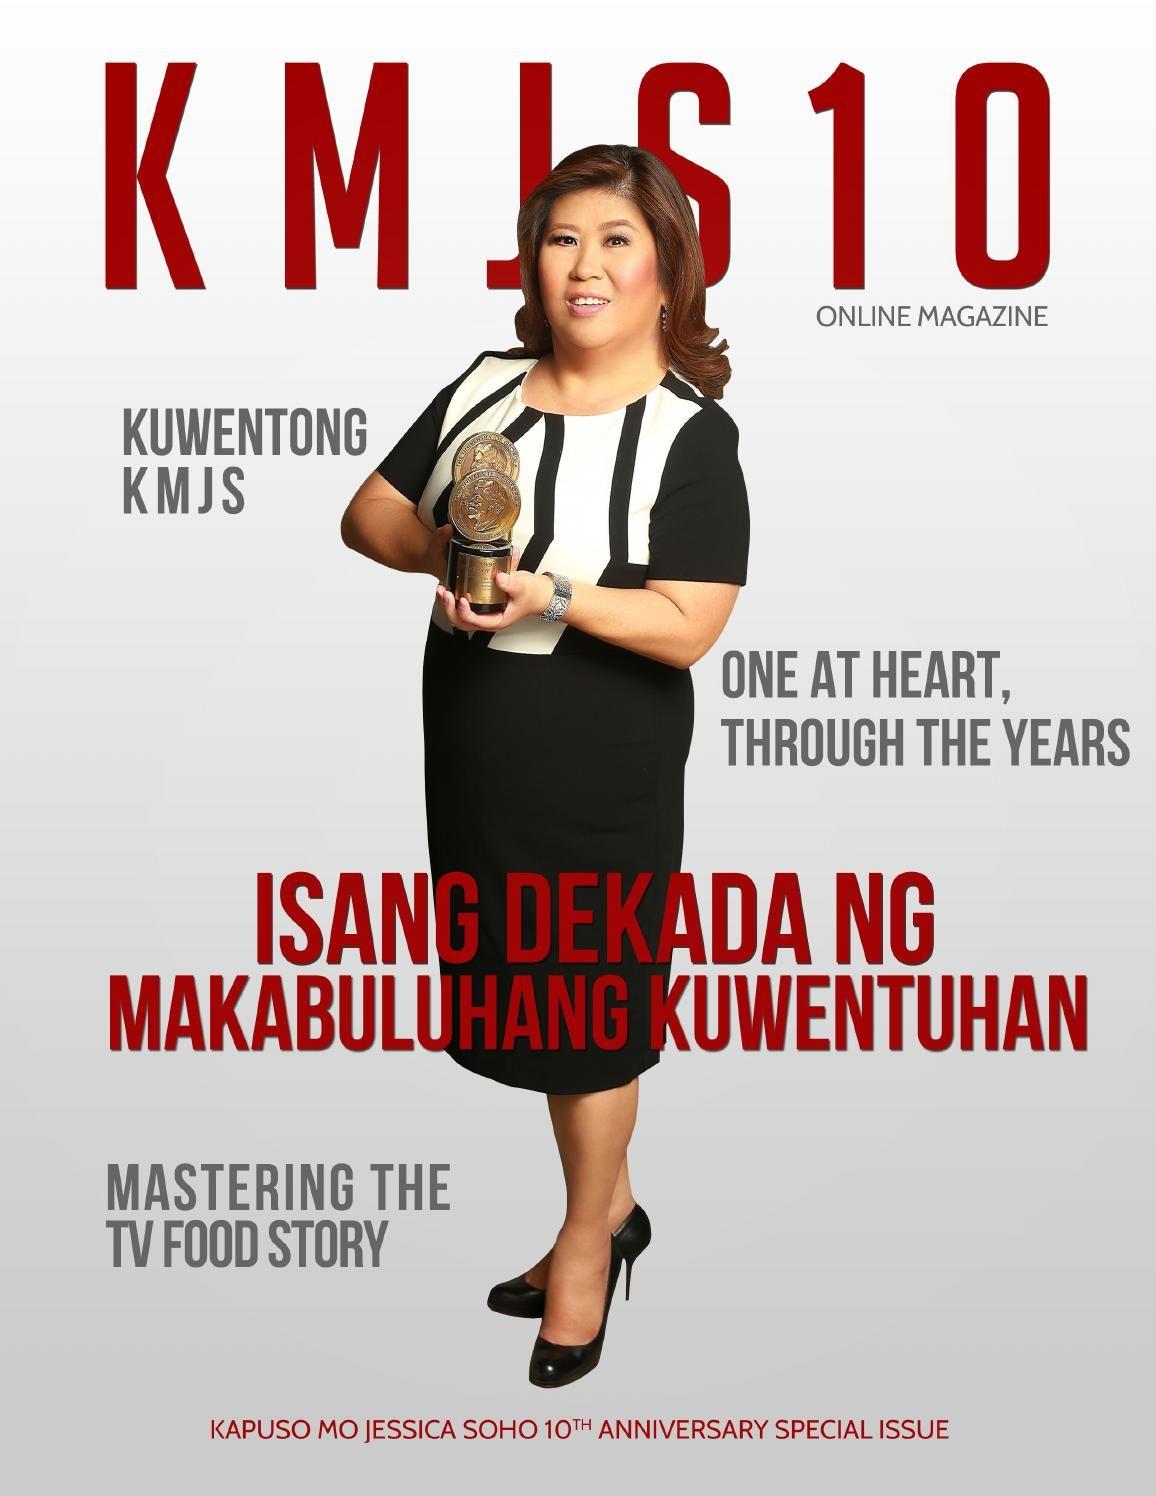 Kapuso Mo Jessica Soho Philippines TV Magazine Celebrates #KMJS10